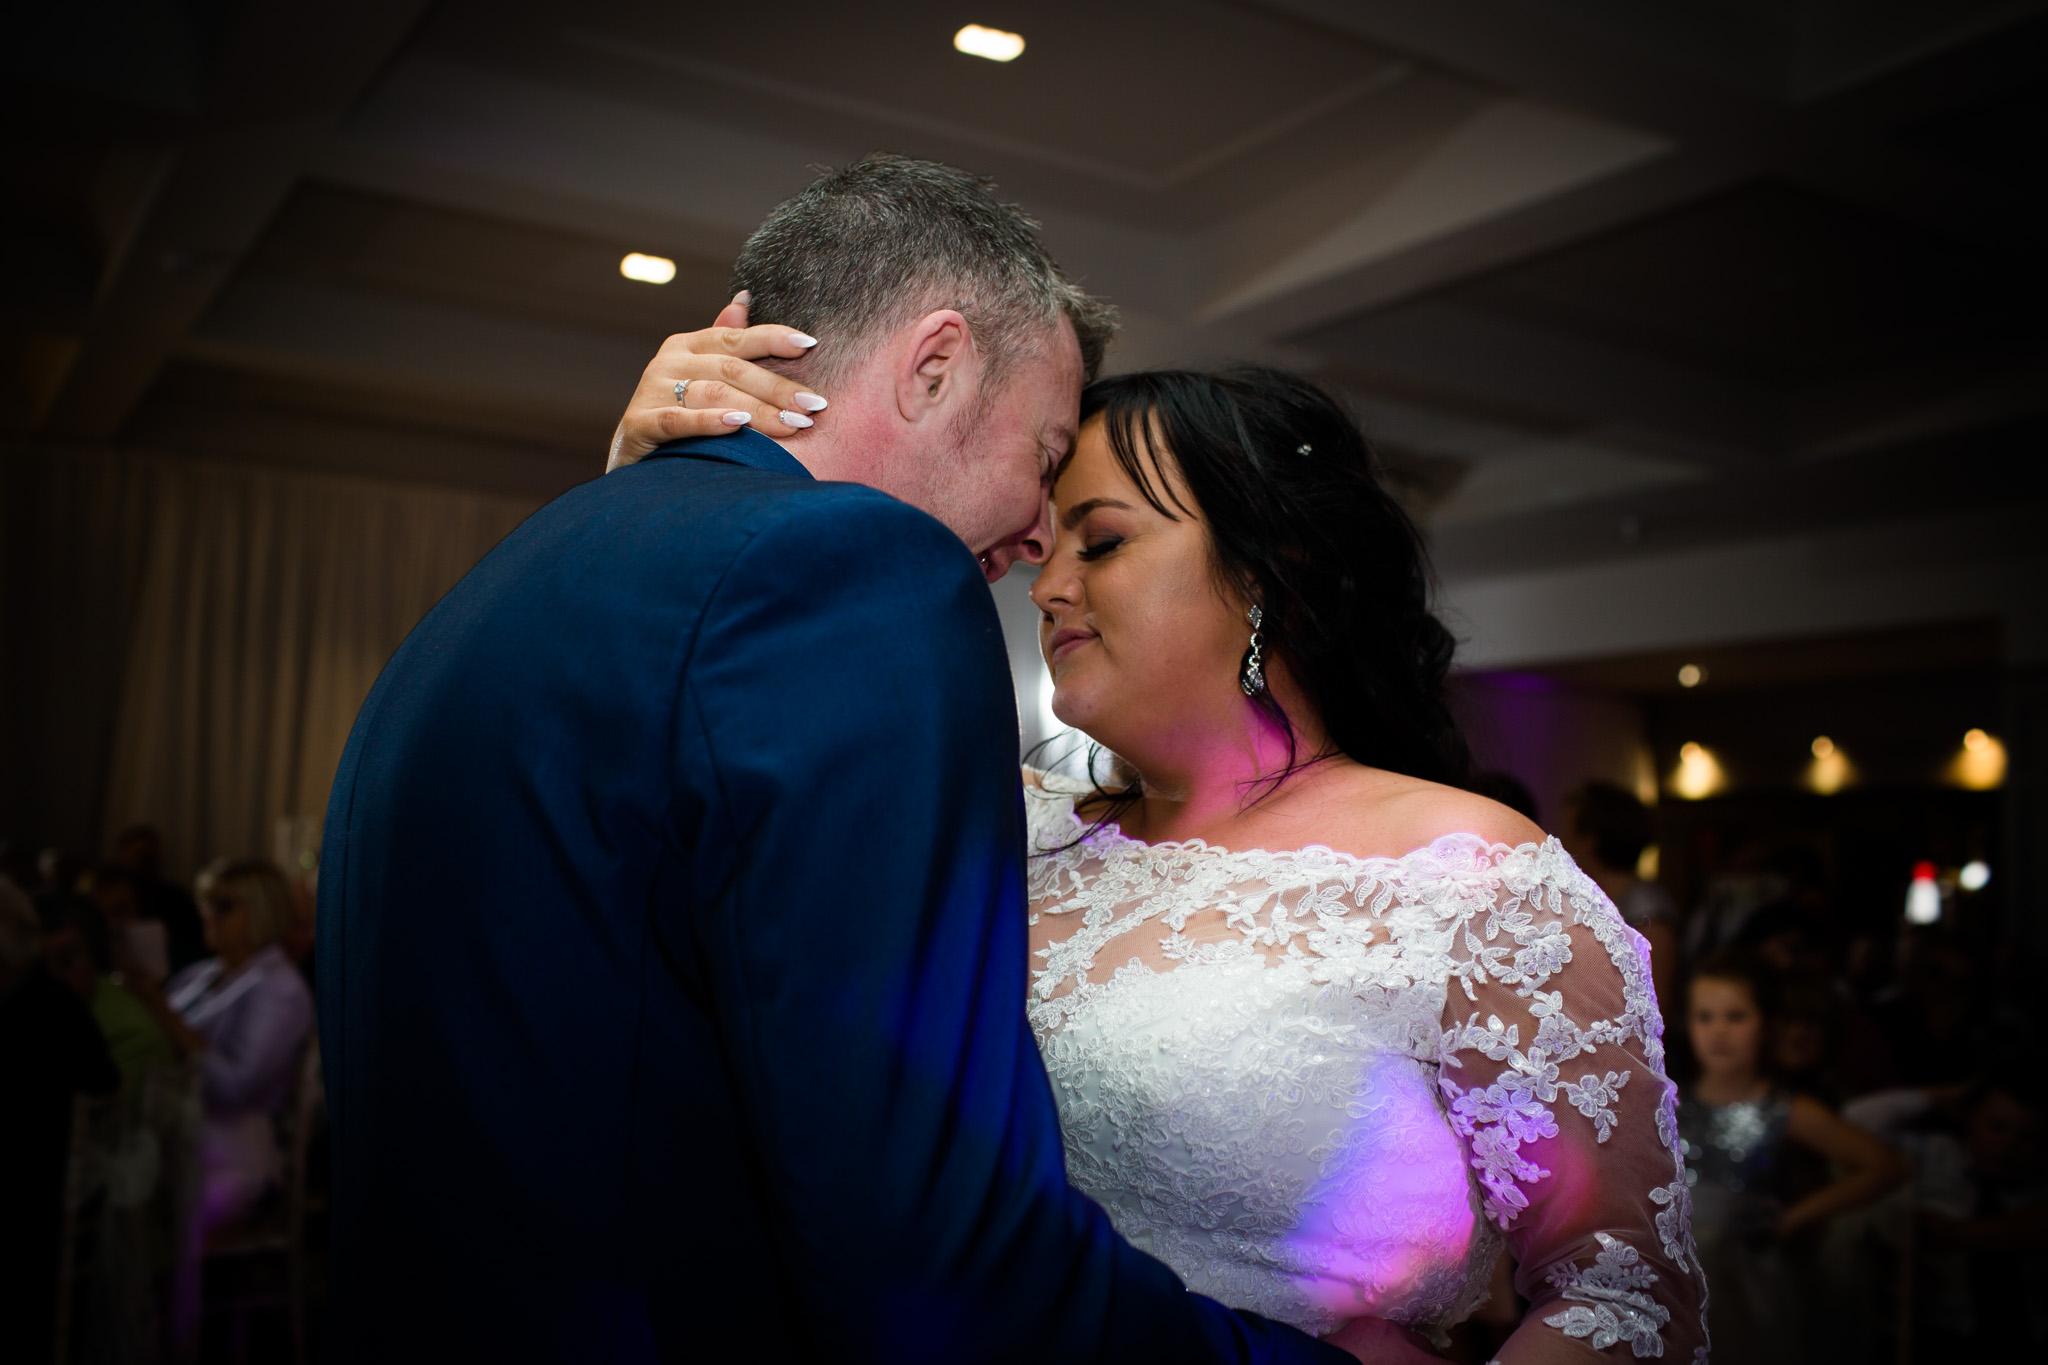 Mark_Barnes_Northern_Ireland_Wedding_Photography_Marine_hotel_ballycastle_Wedding_Photography_Janet&Darren-41.jpg